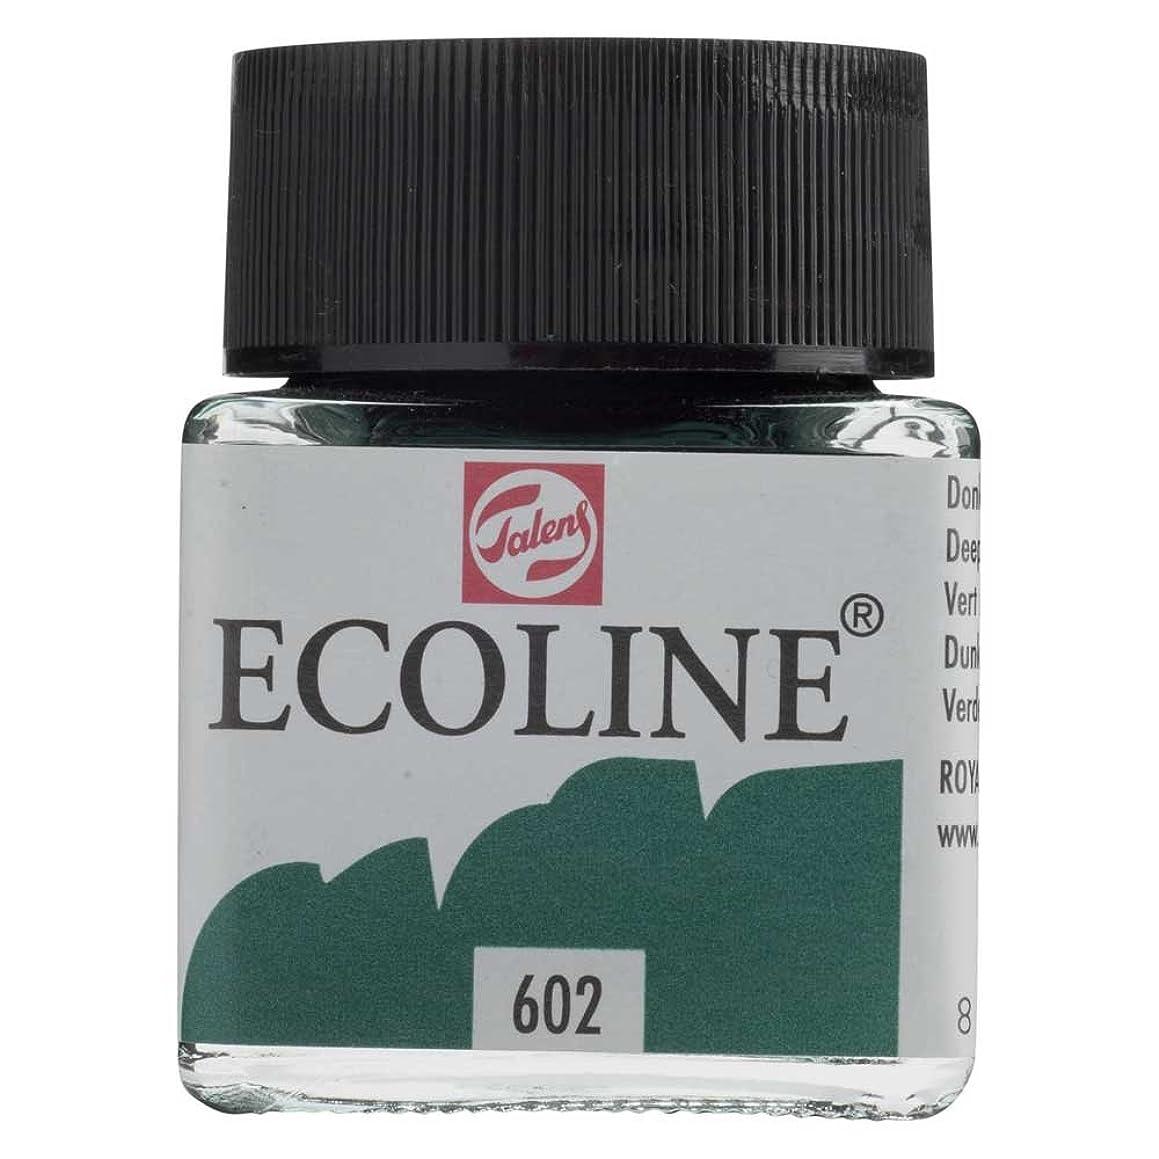 Royal Talens Ecoline Liquid Watercolor, 30ml Bottle, Deep Green (11256020)